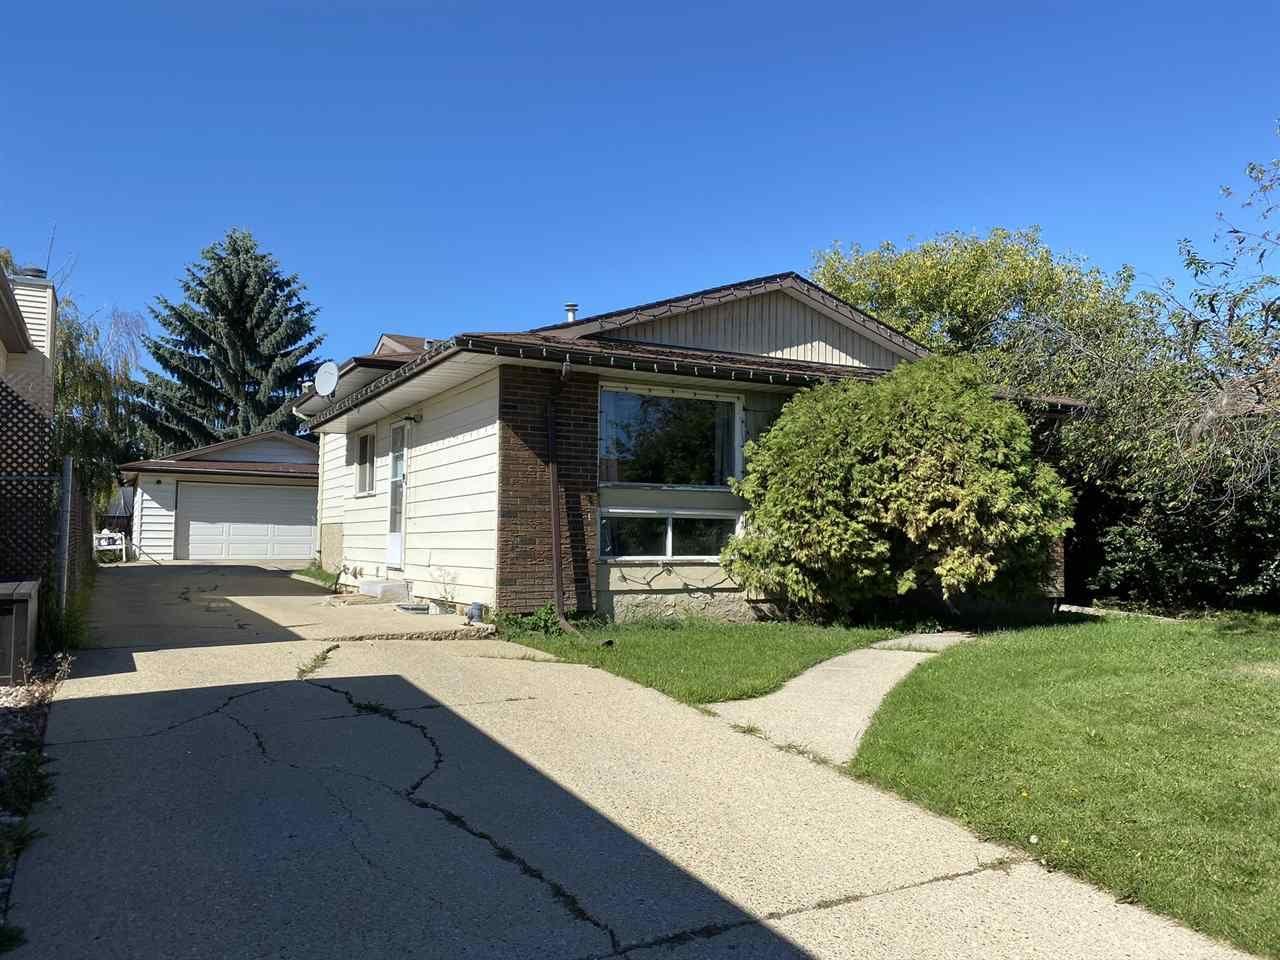 Main Photo: 1312 35 Street in Edmonton: Zone 29 House for sale : MLS®# E4240102